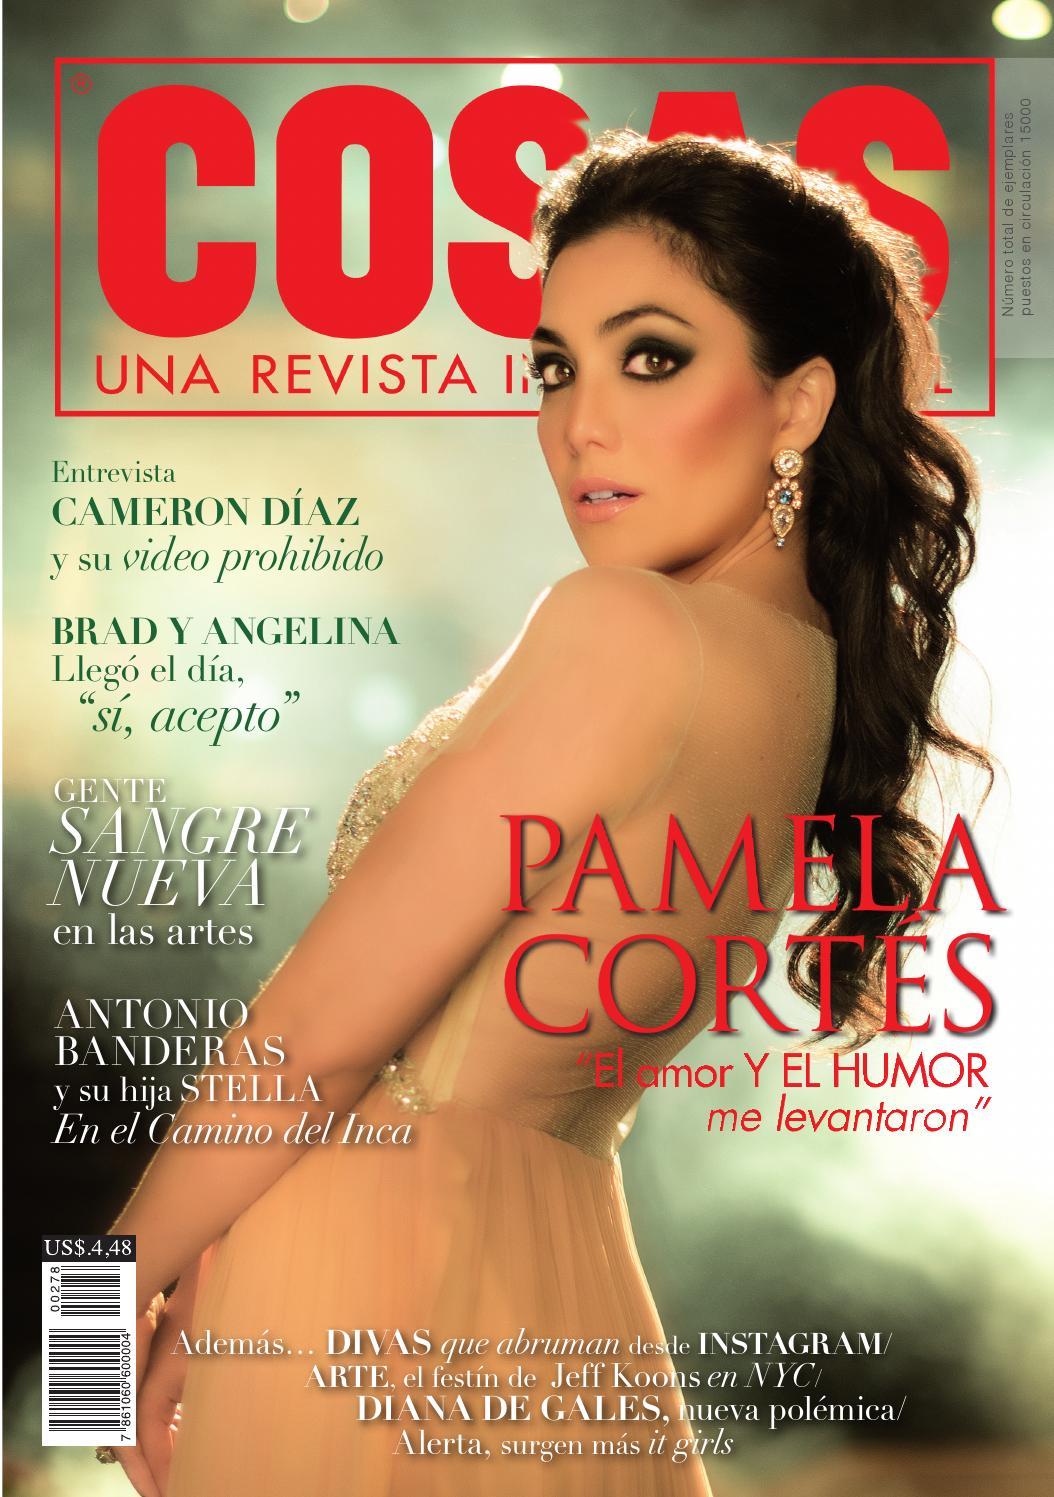 Revistas De Sexo Anúncios-7649